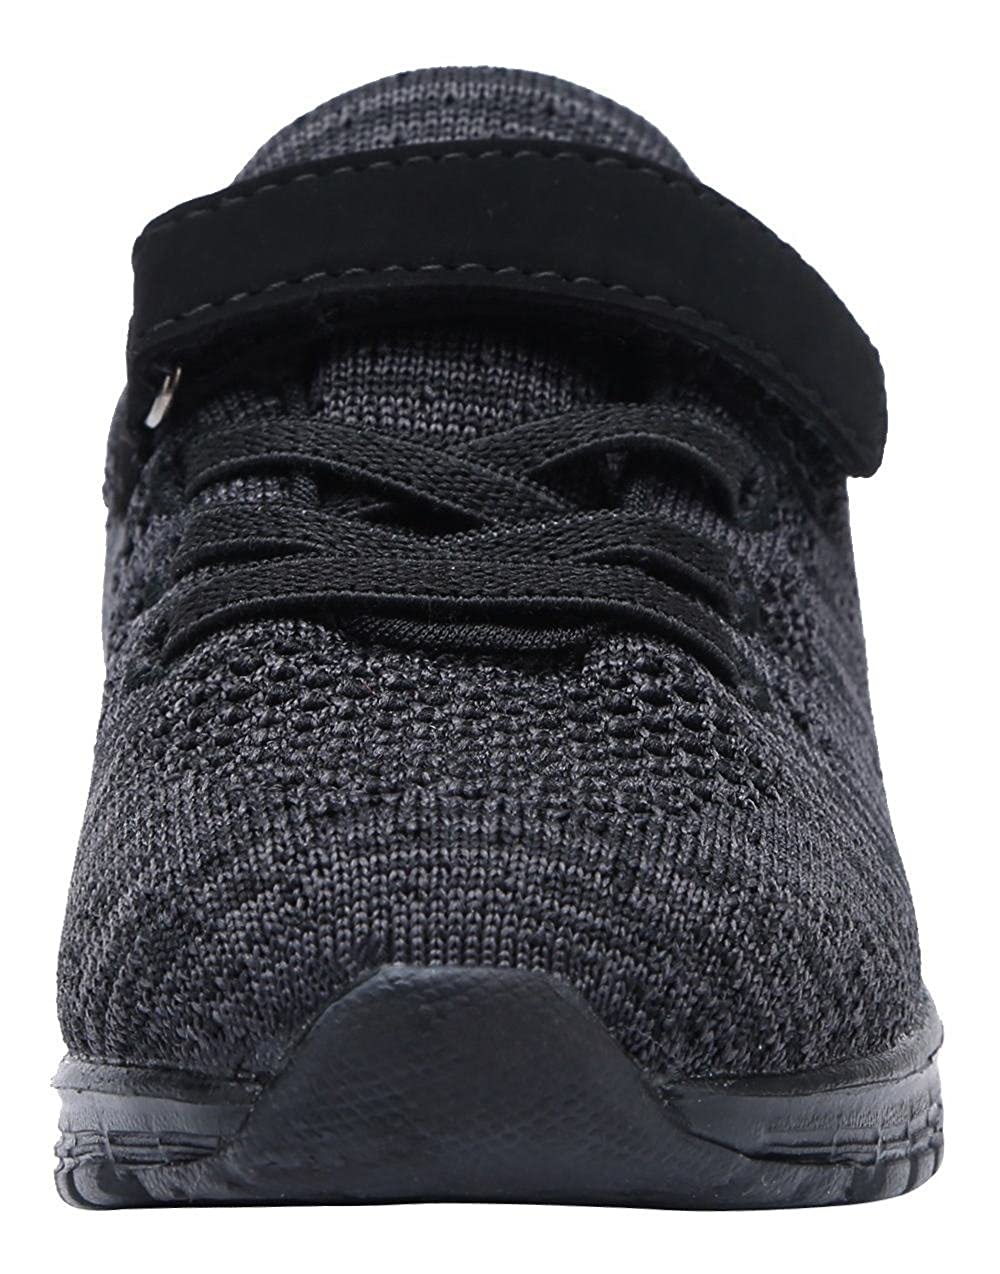 Umbale Girls Flyknit Sneakers Comfort Running Shoes Toddler//Kids